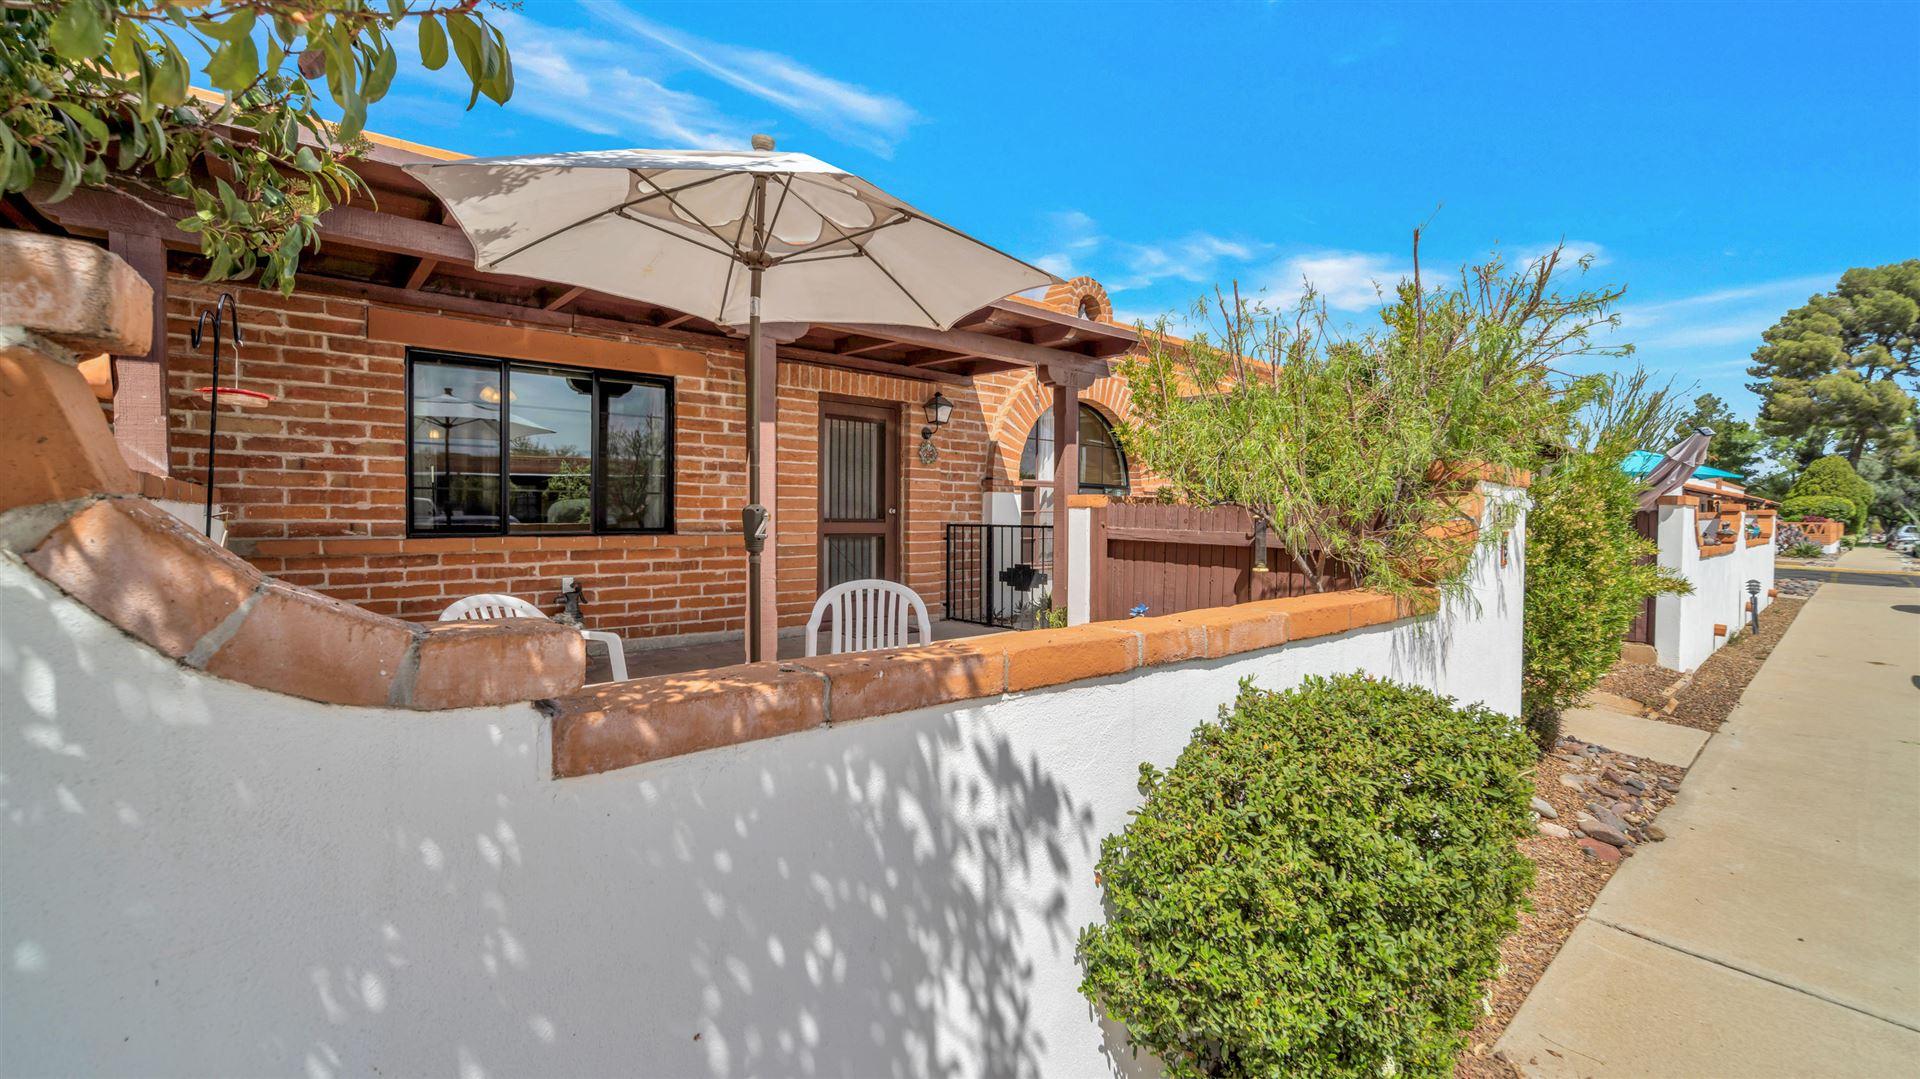 316 S Paseo Pena #B, Green Valley, AZ 85614 - MLS#: 22109503